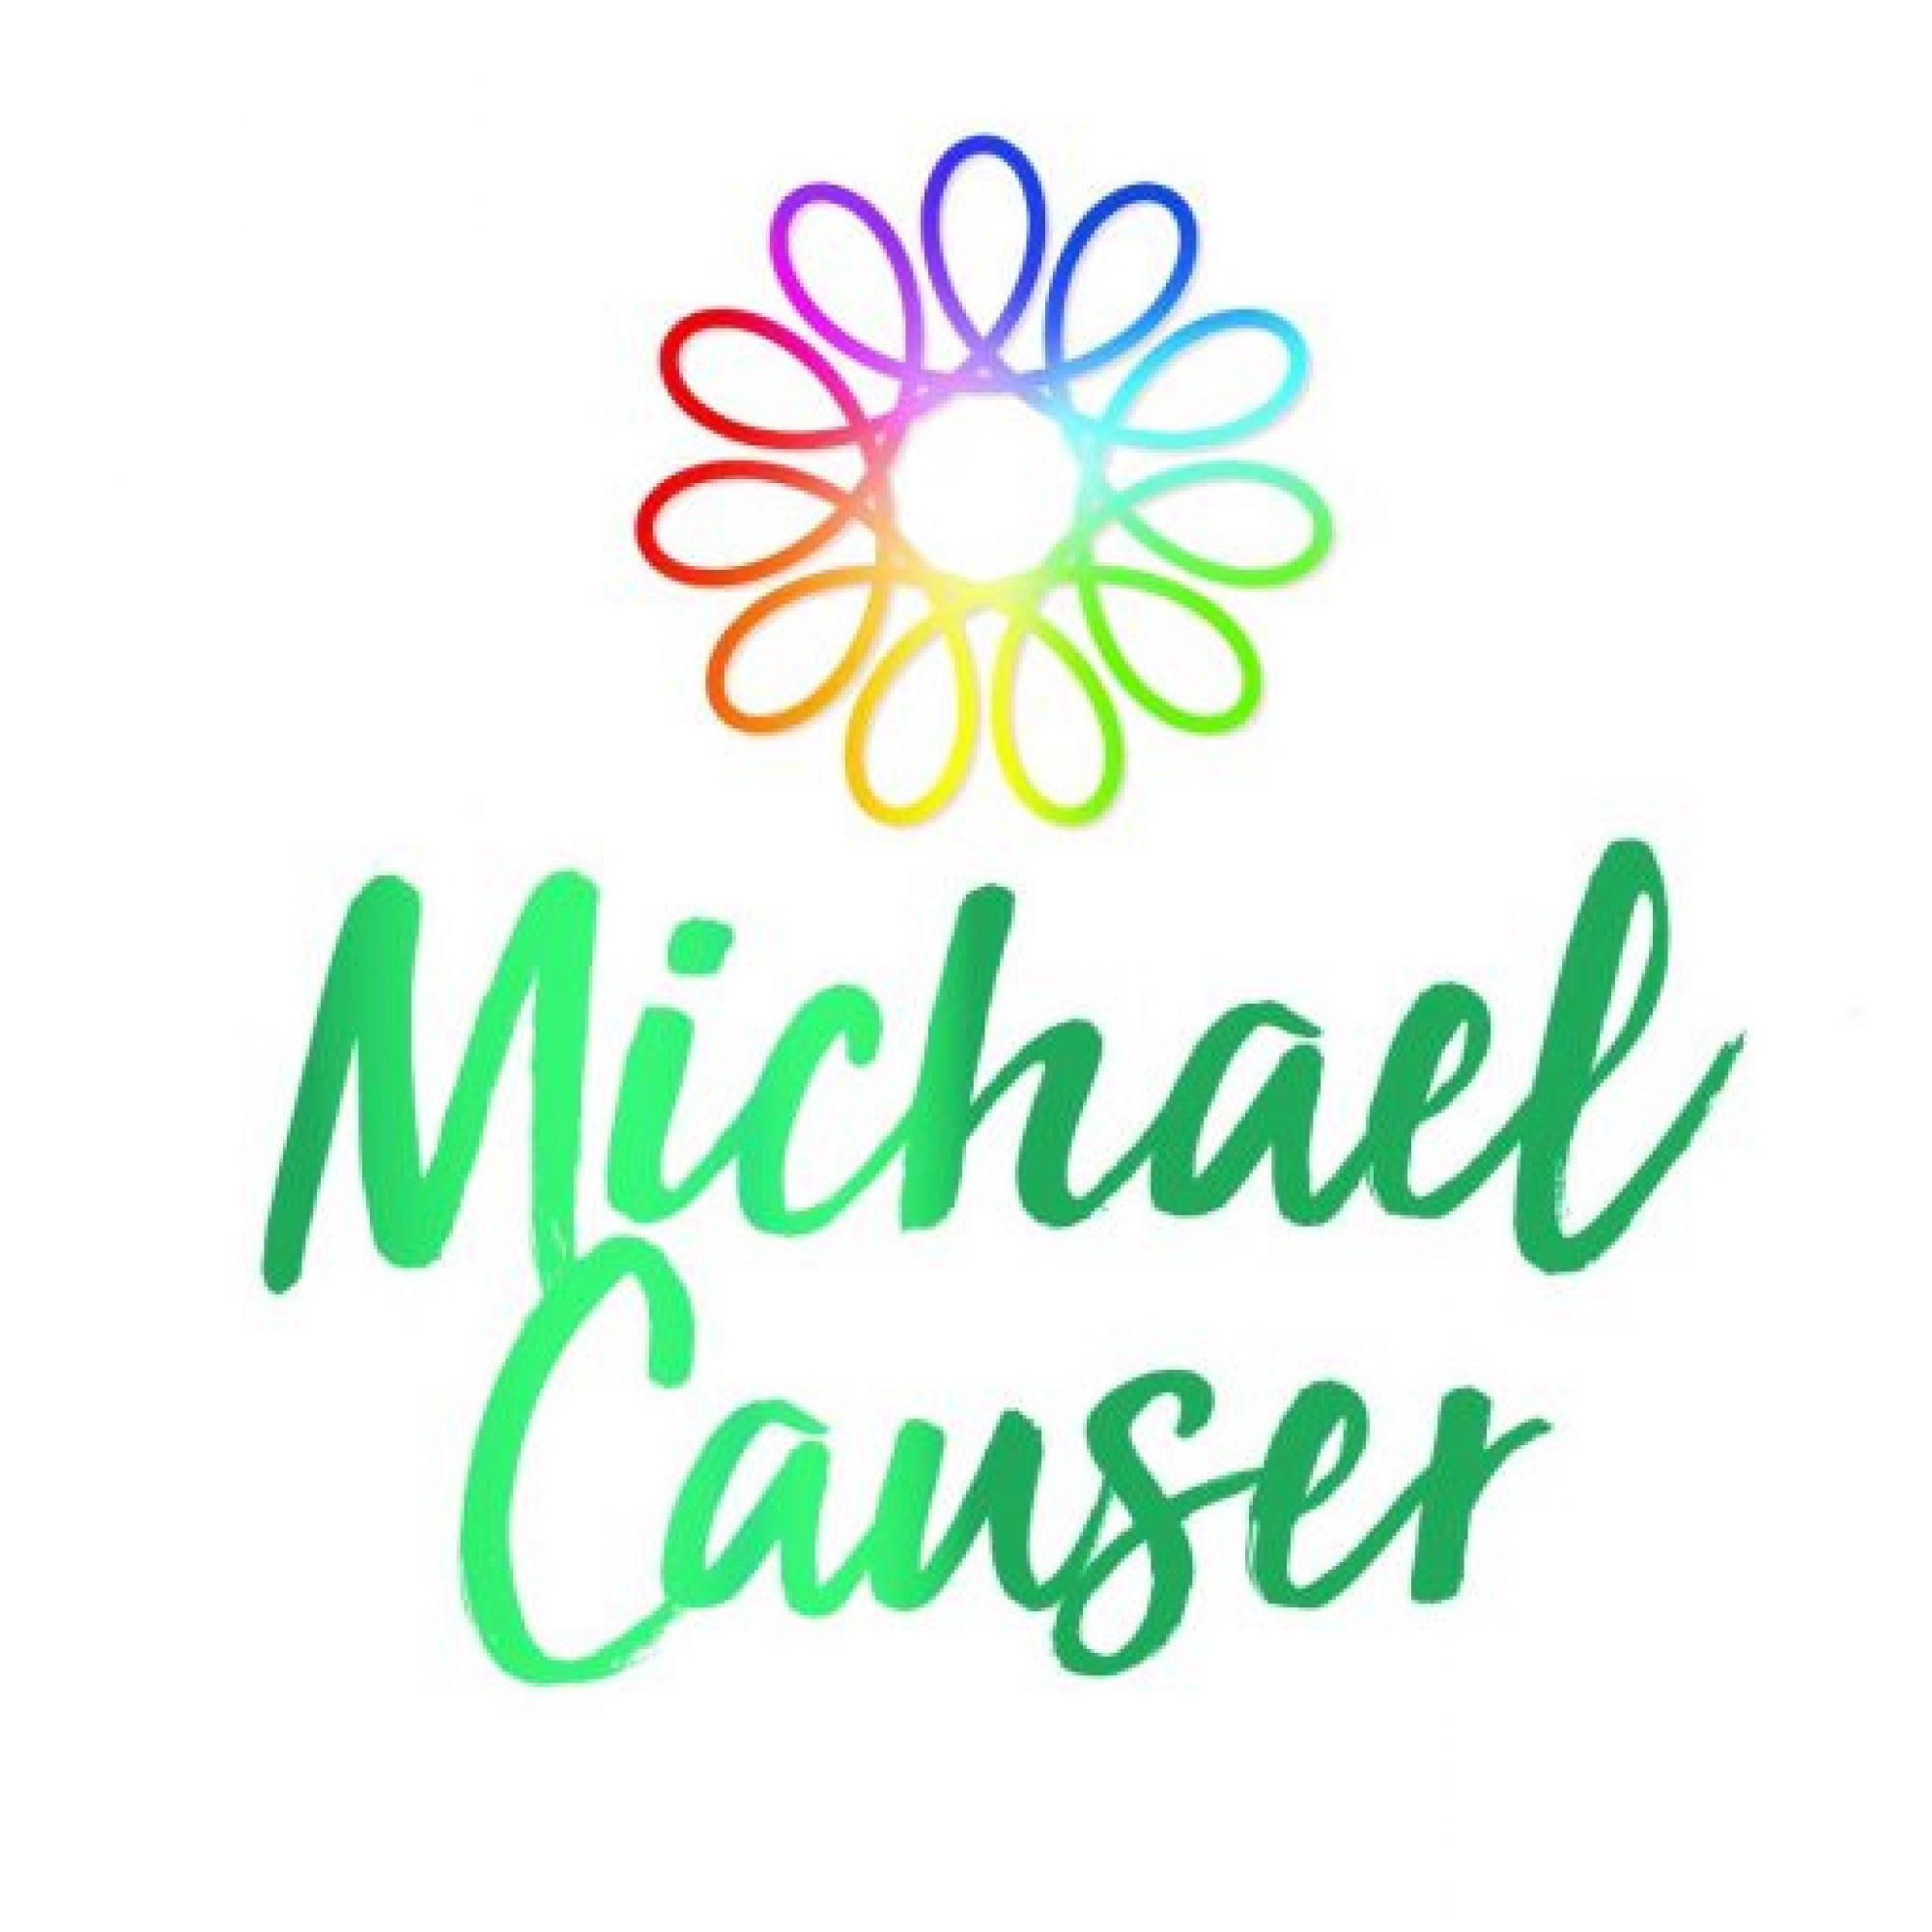 """Love is No Crime"" – The 7th Annual Vigil to commemorate Michael's life"